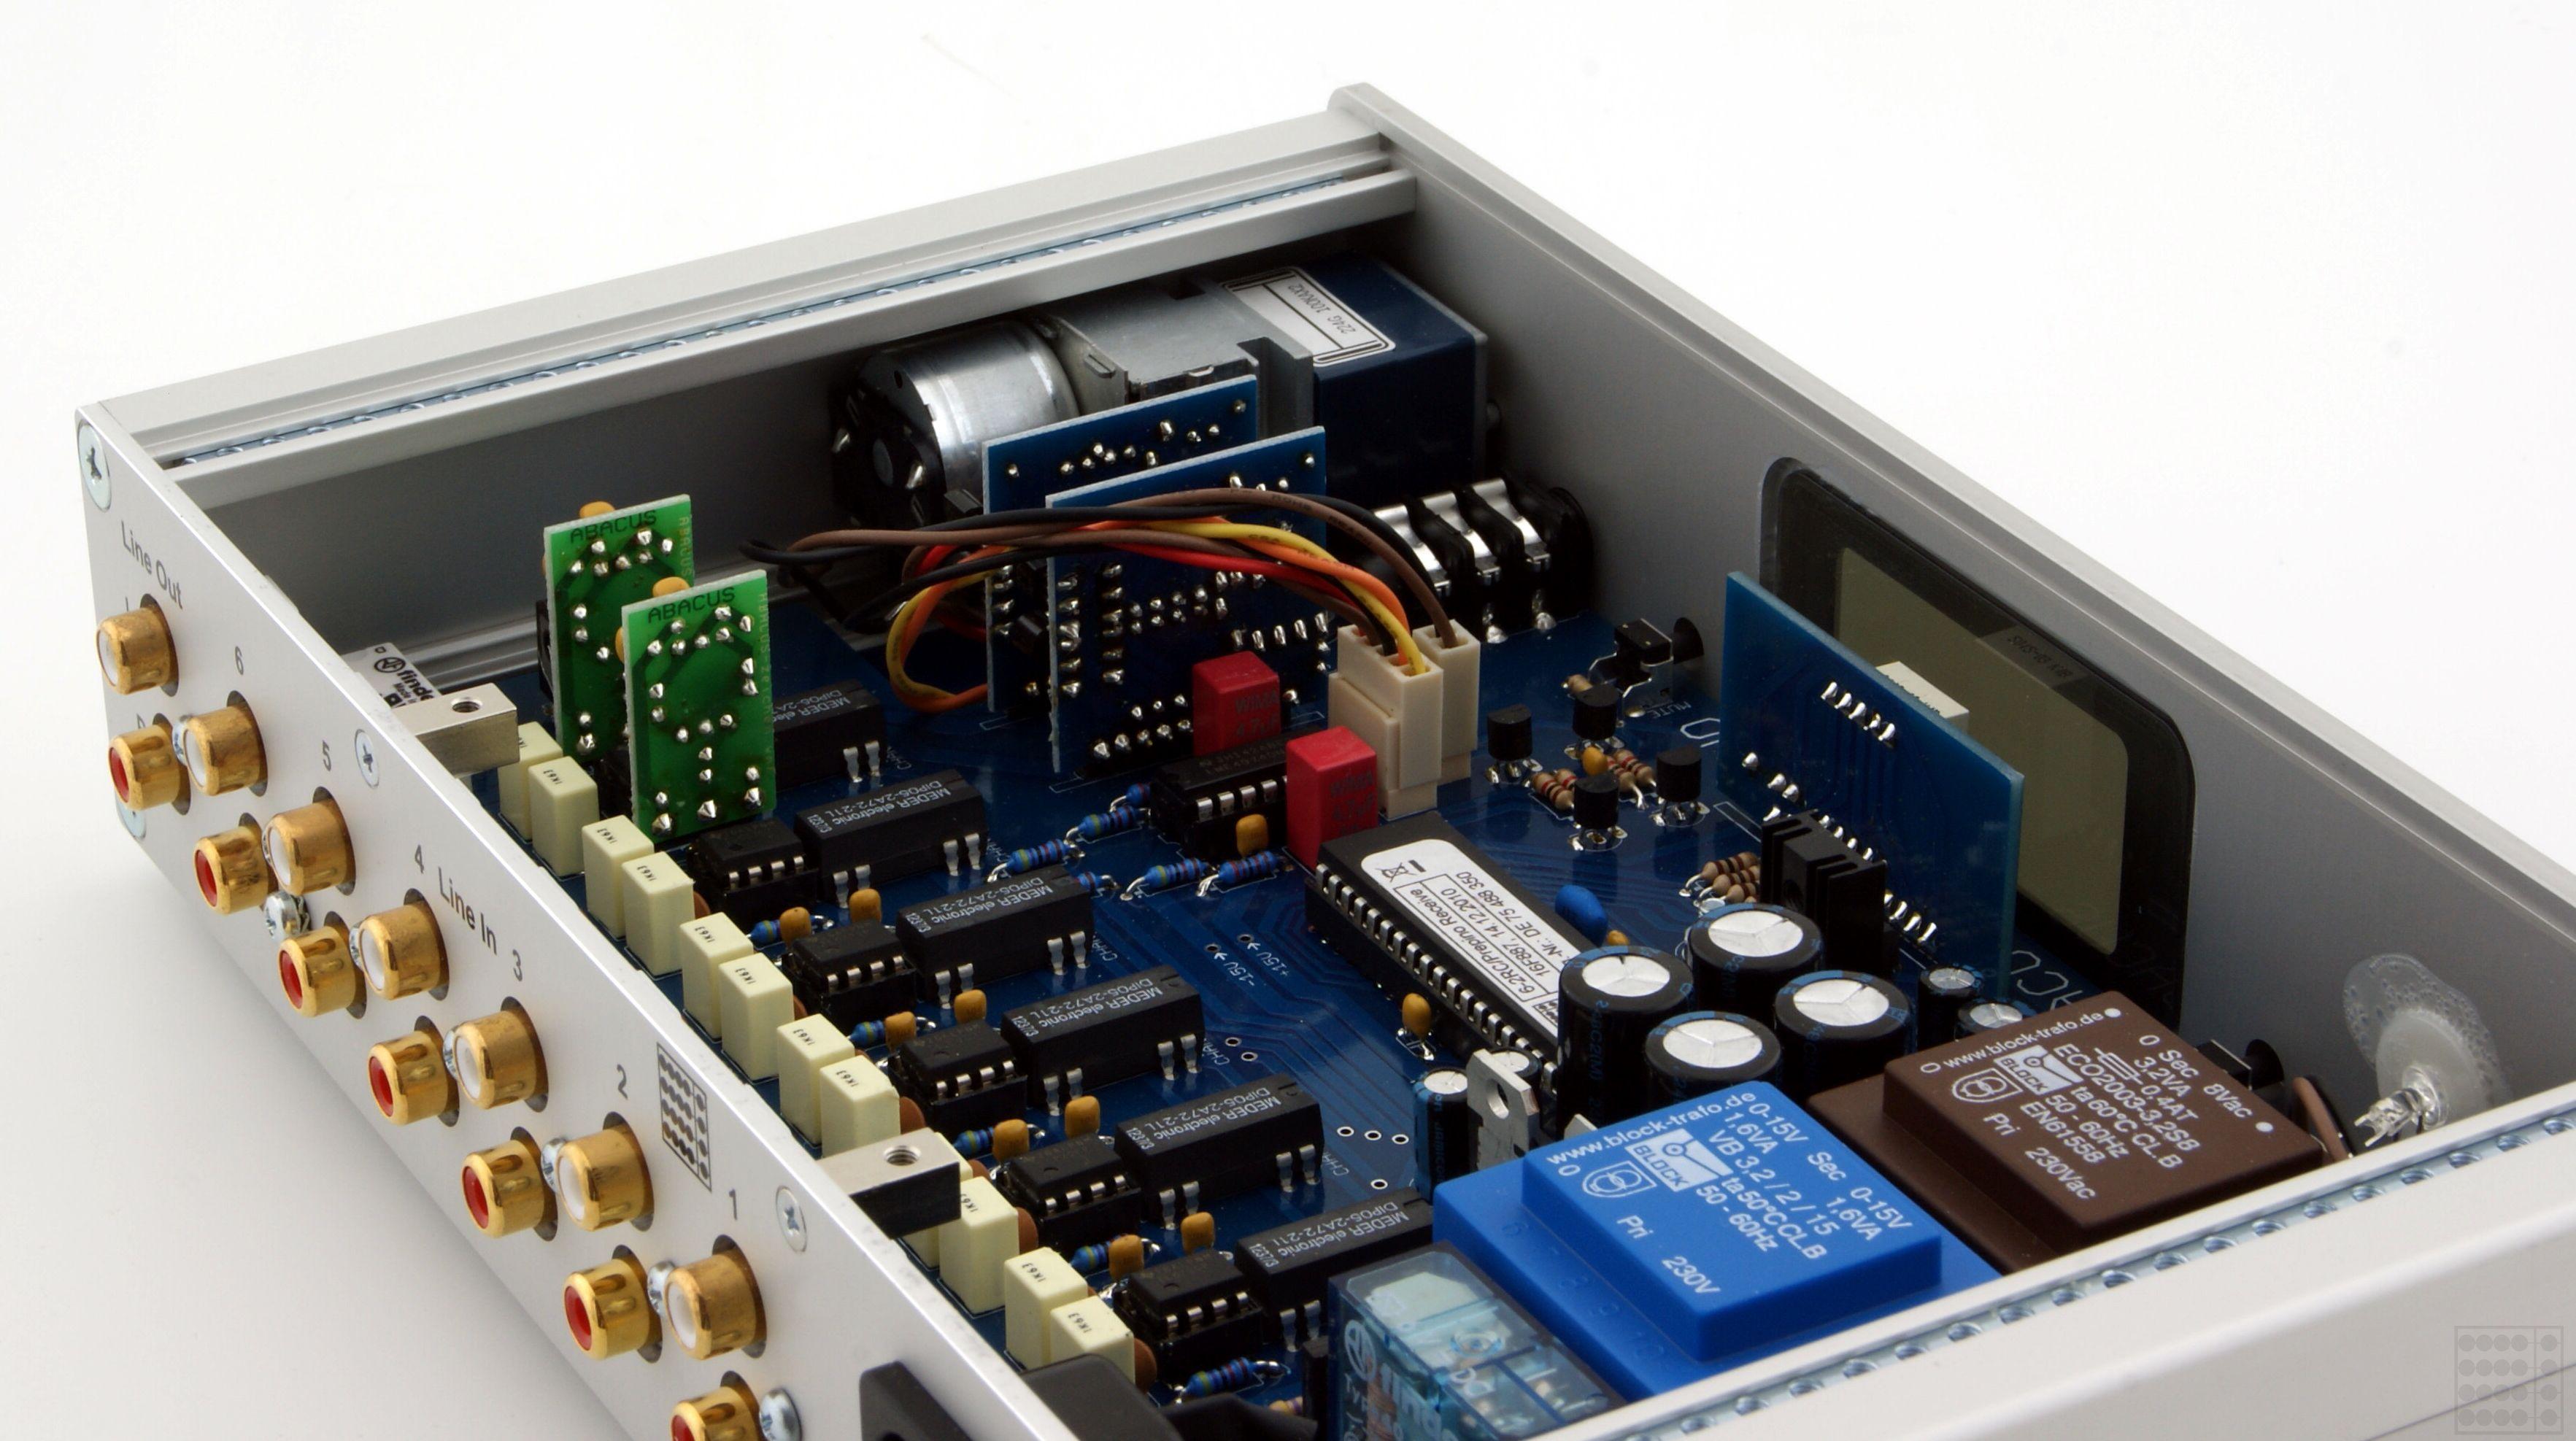 ABACUS electronics - Prepino 13 RC